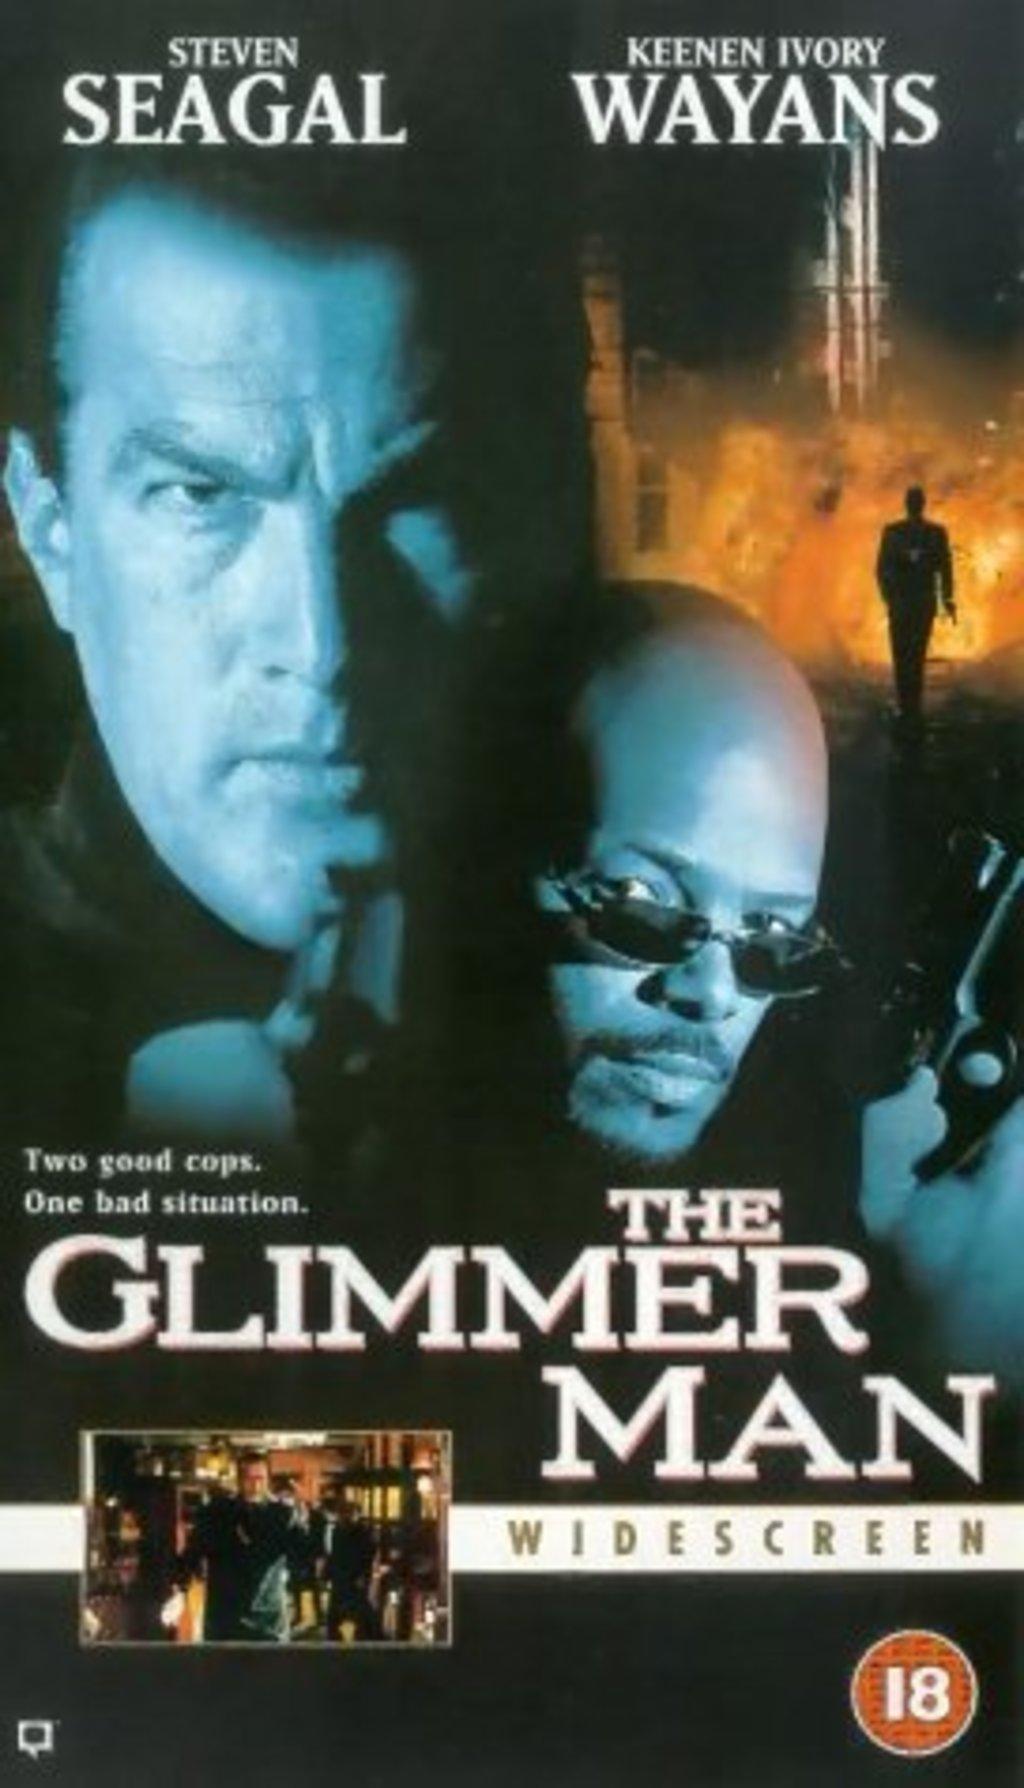 Watch The Glimmer Man On Netflix Today Netflixmovies Com